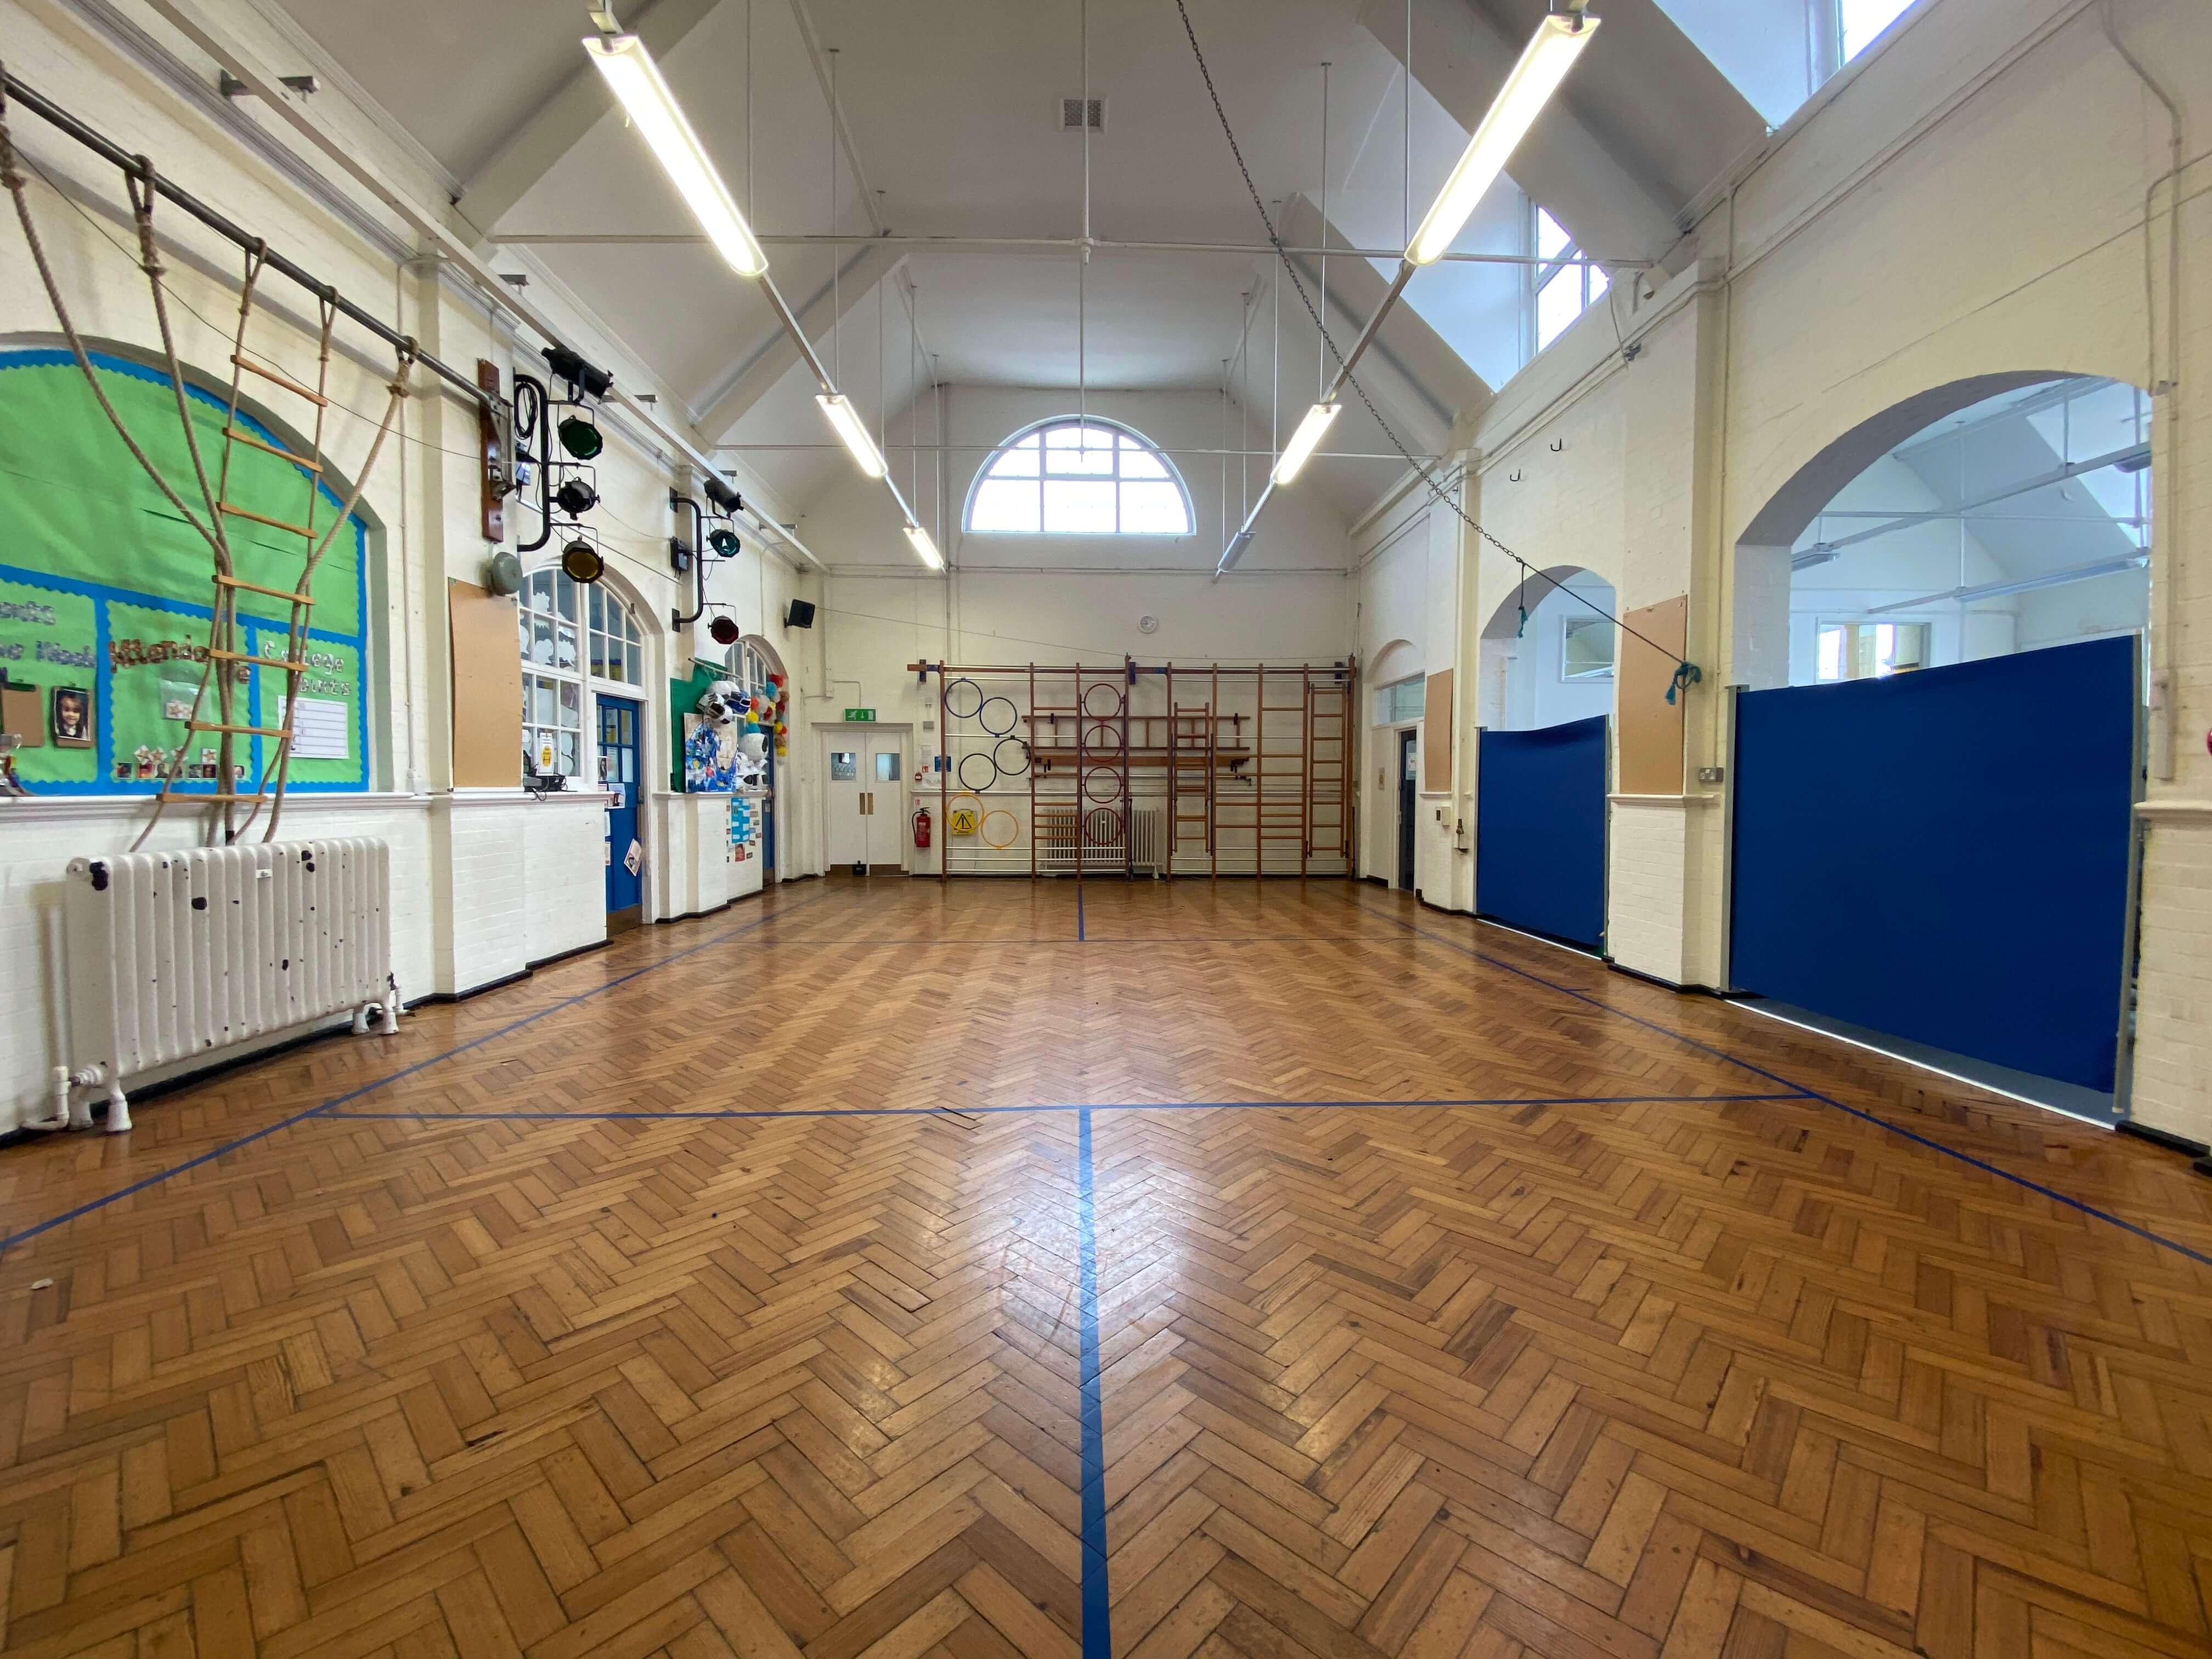 Hollickwood Primary School Main Hall